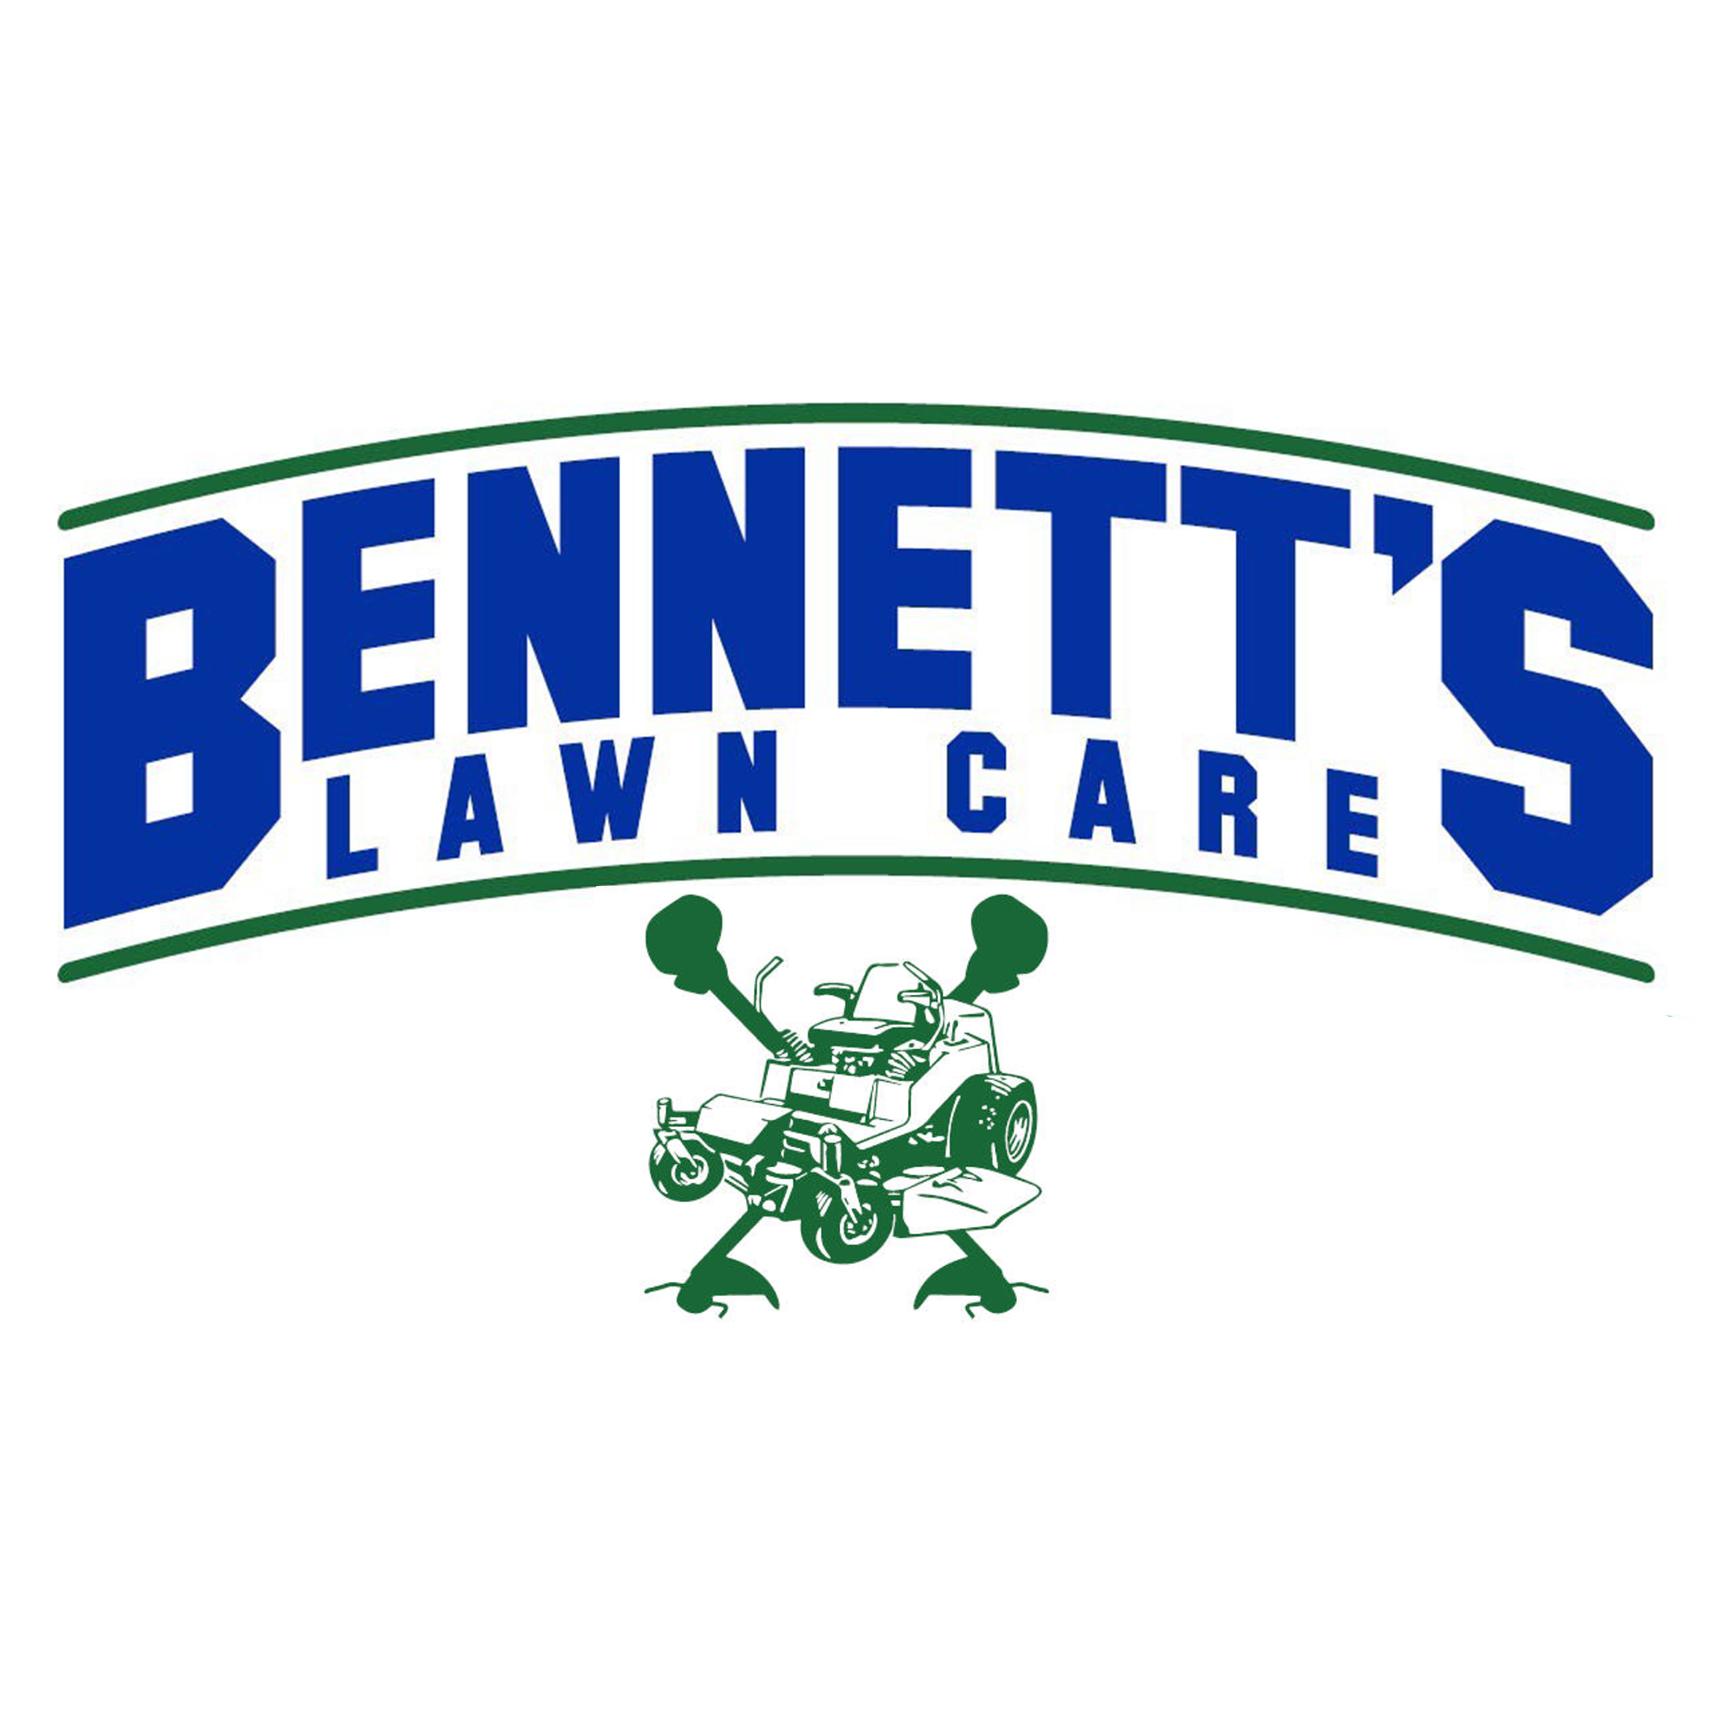 Bennett's Lawn Care